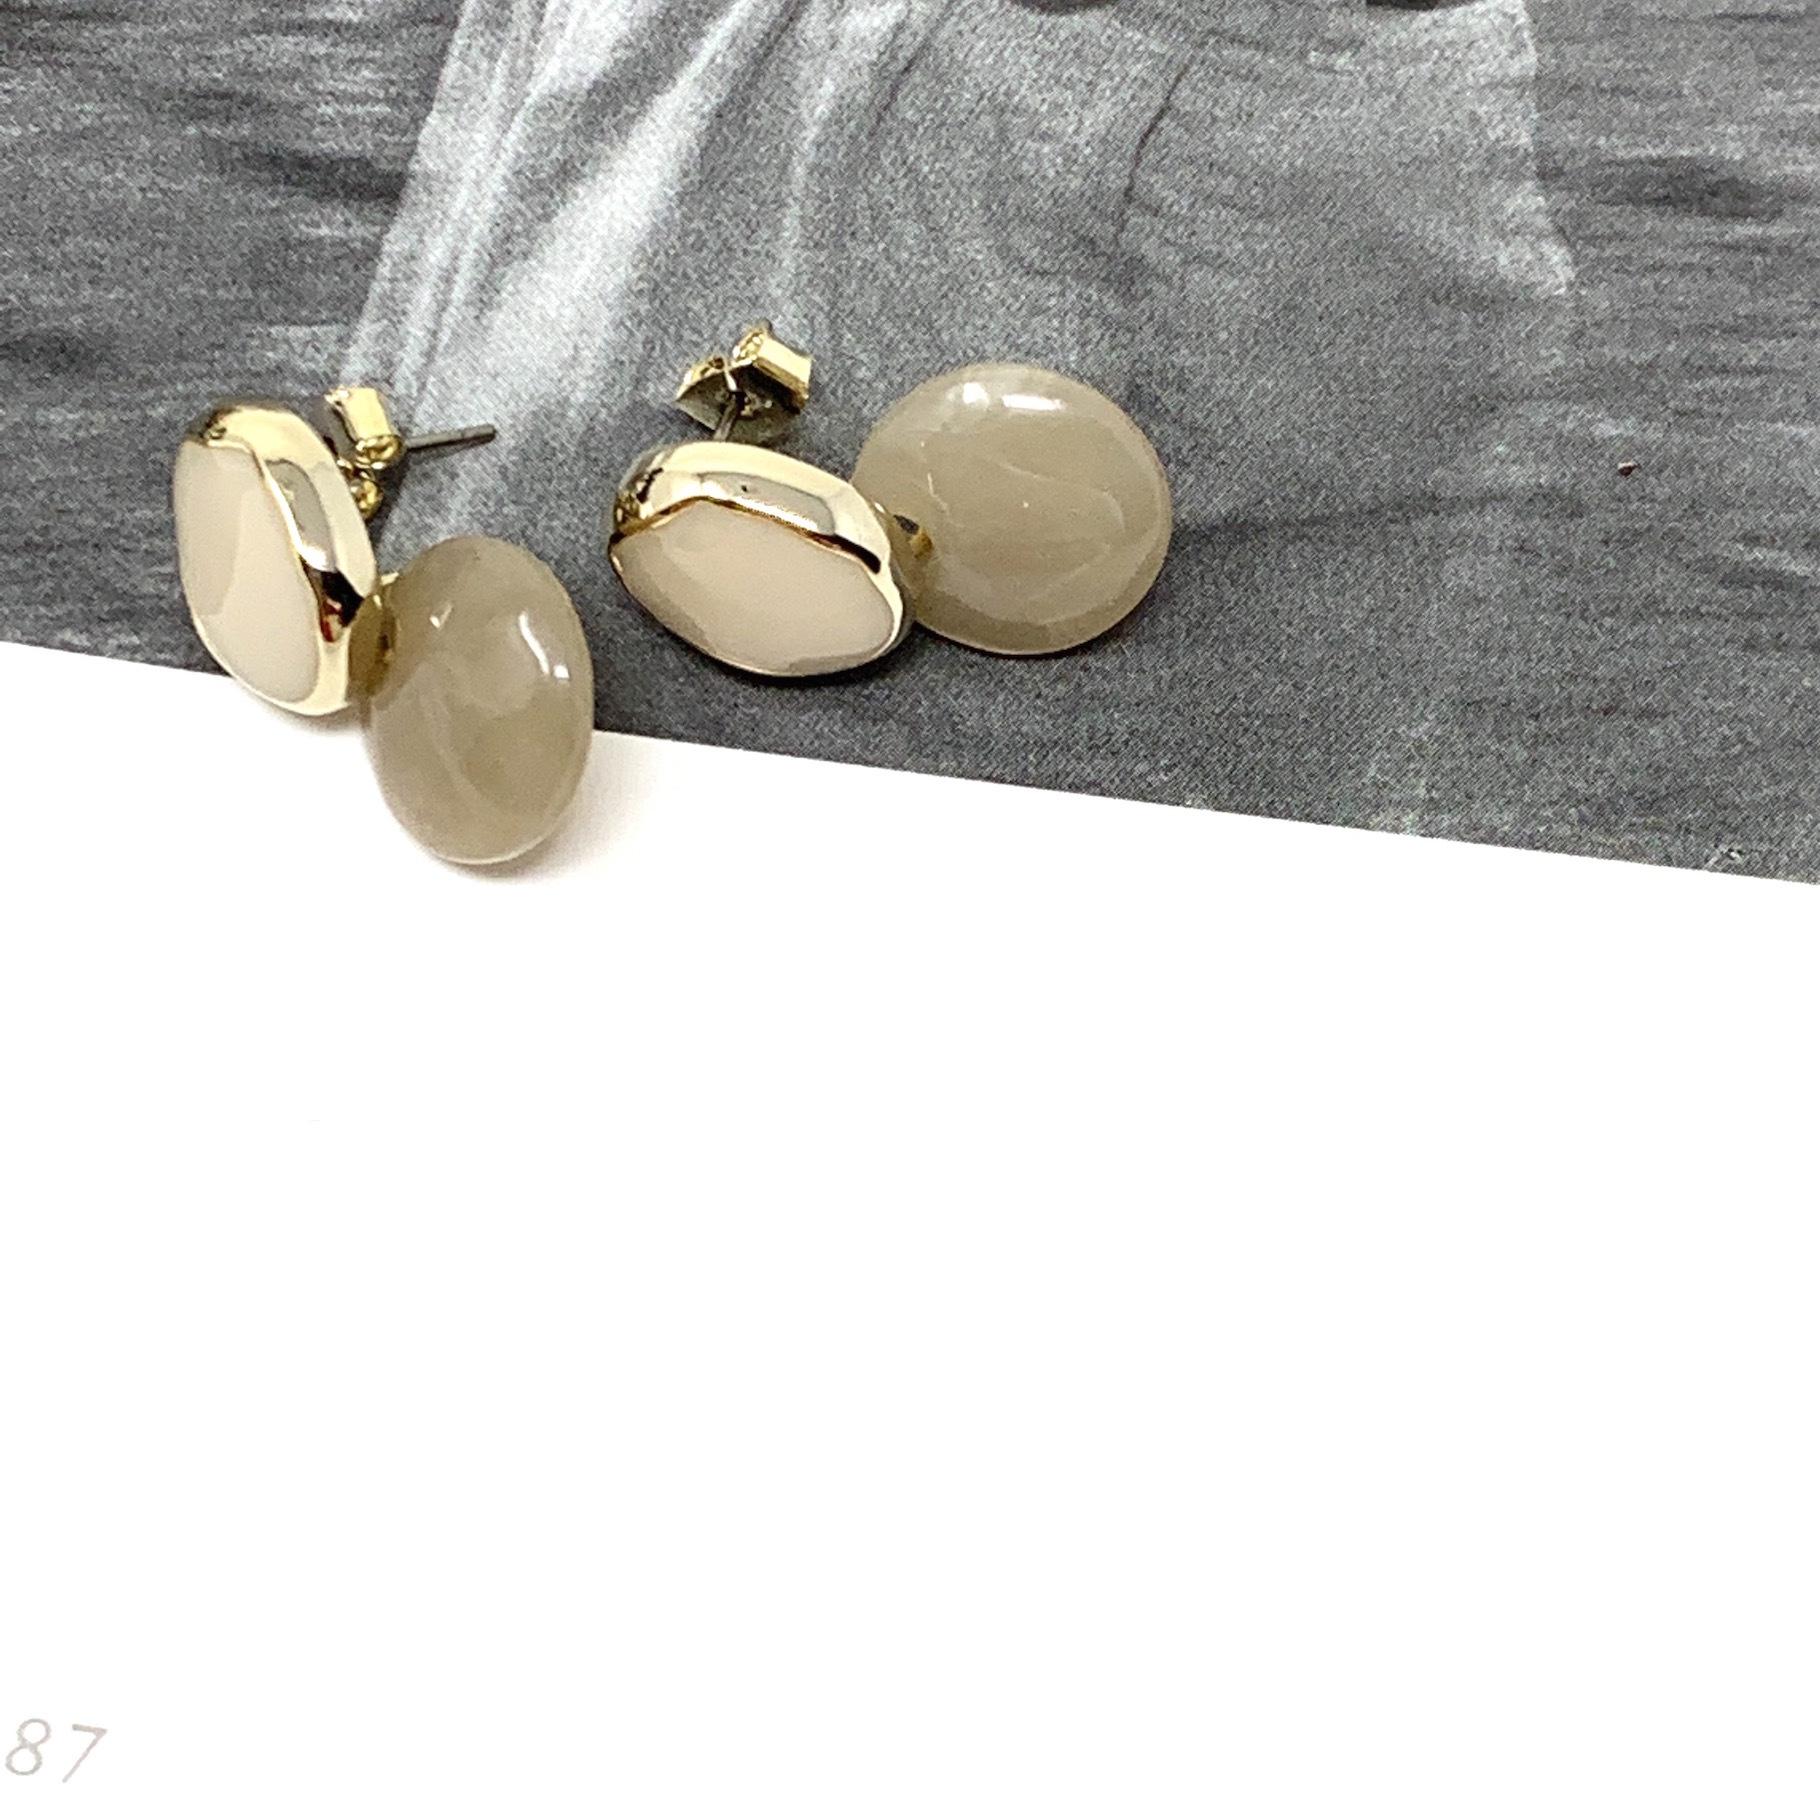 Resin ball  Pierce |ミニボールマーブルピアス| #SP0129|【STELLAPARK】